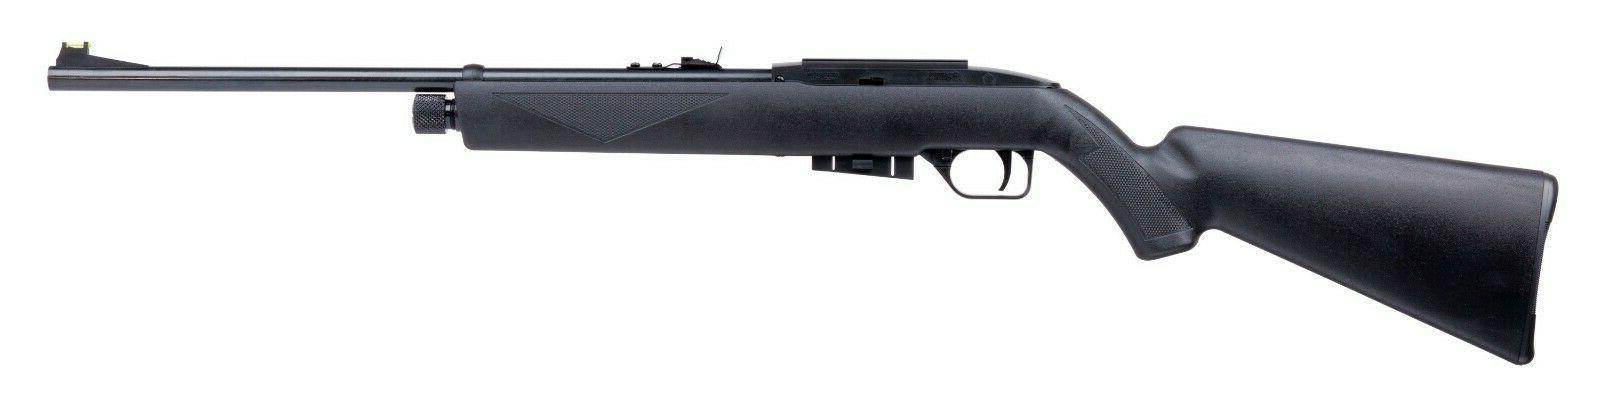 Crosman 1077 CO2 Airgun